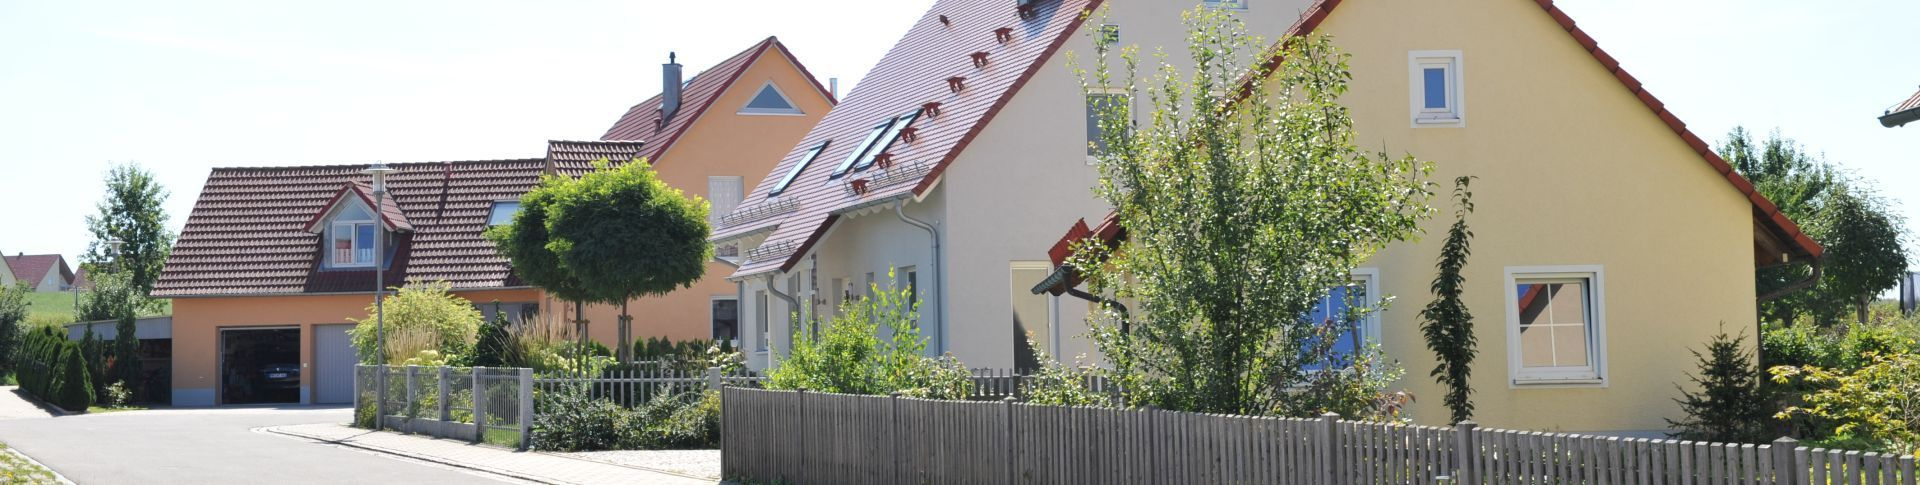 Leben in Freystadt